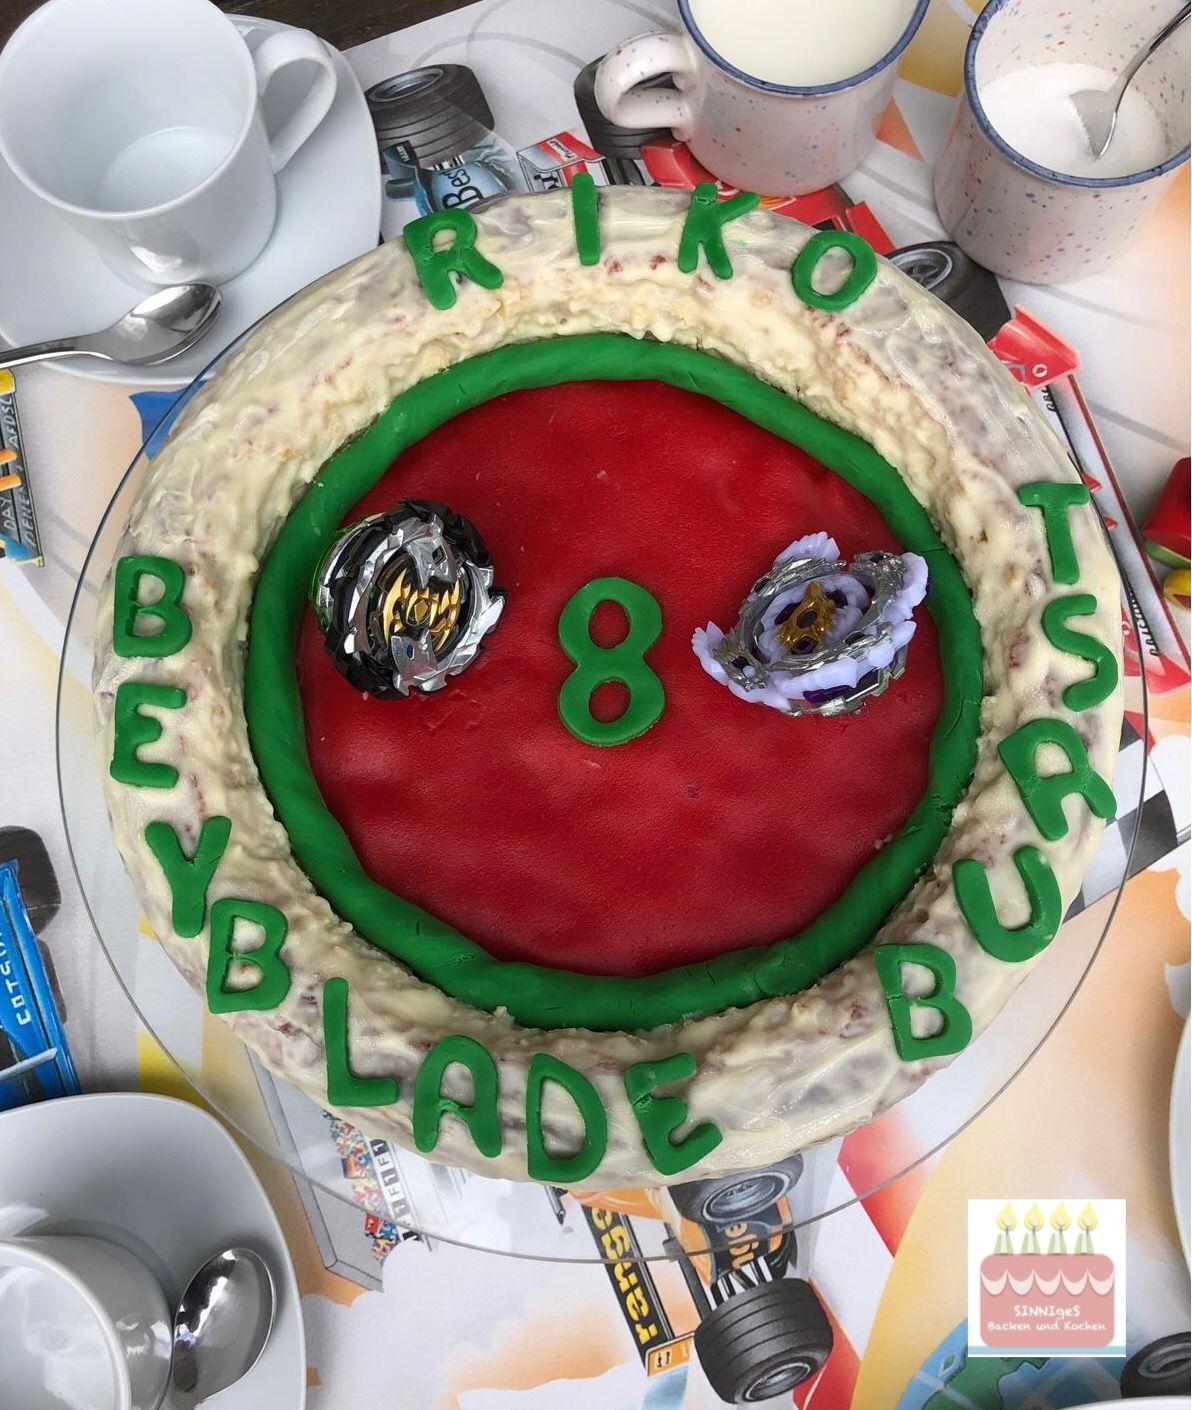 Beyblade Kuchen Arena Geburtstagskuchen Fur Jungen Schoko Gugelhupf Lebensmittel Essen